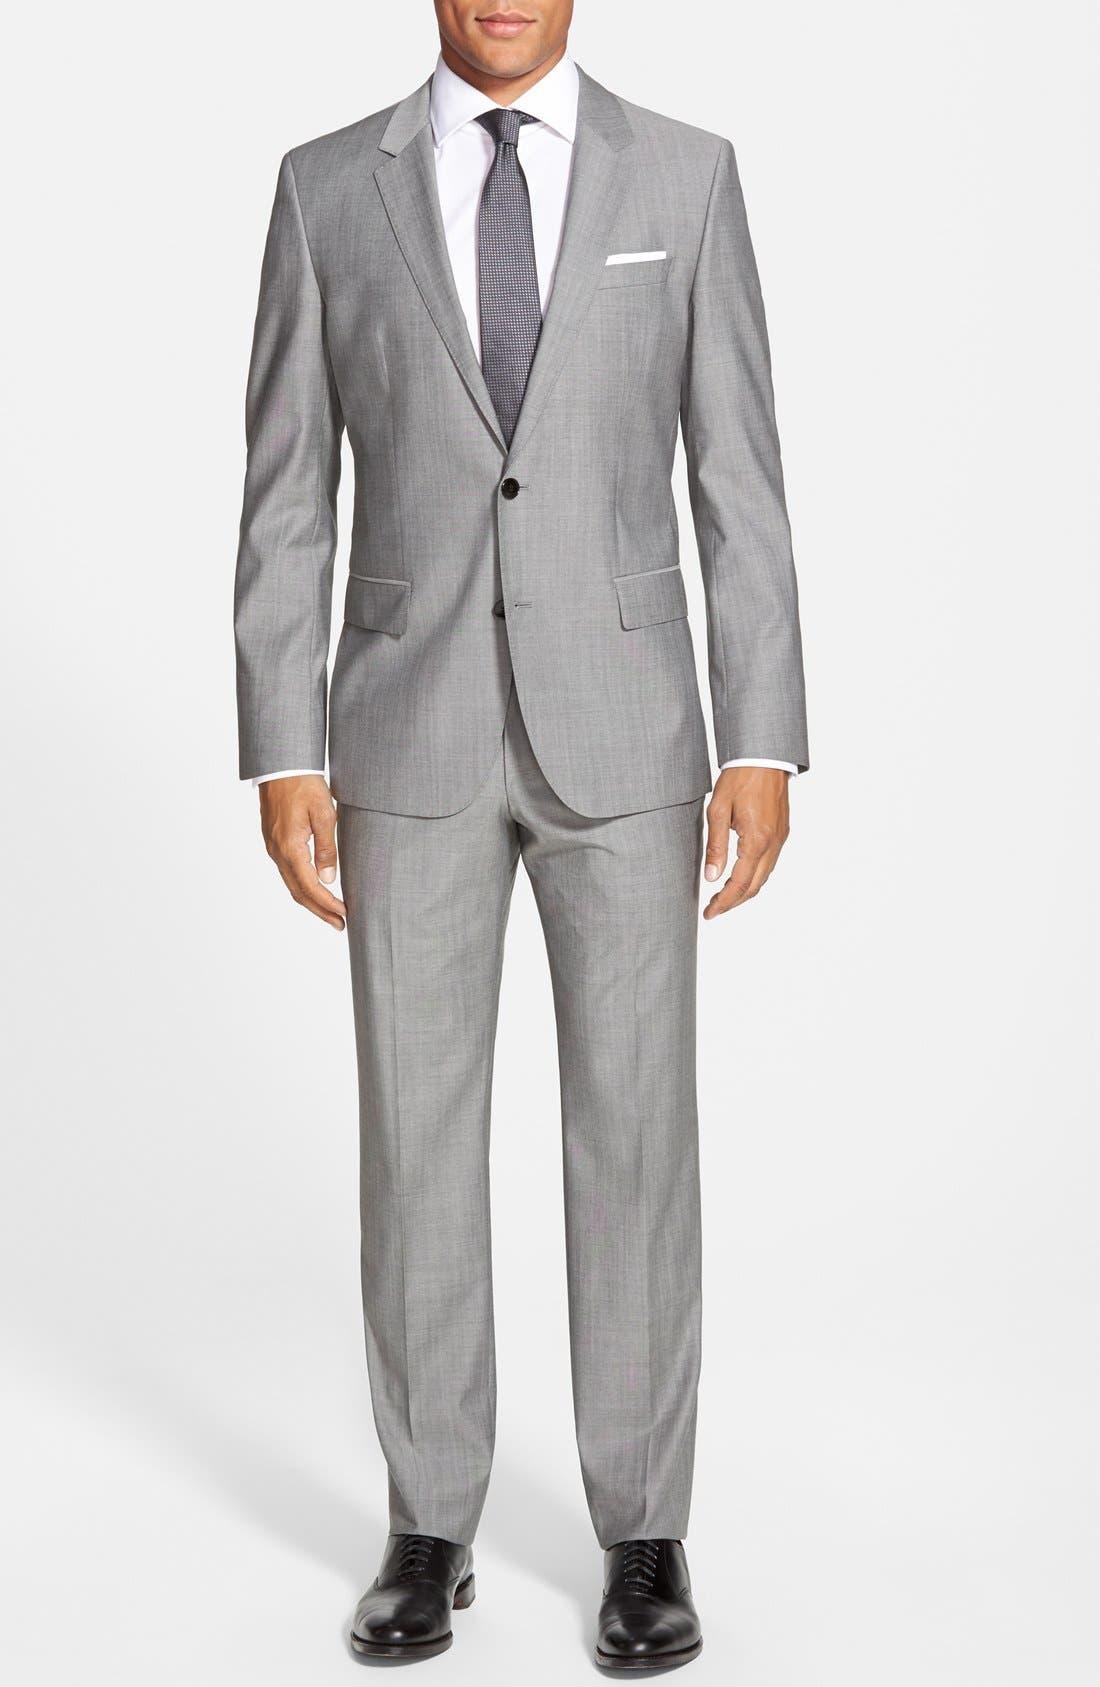 Main Image - BOSS 'Huge/Genius' Trim Fit Solid Wool Suit